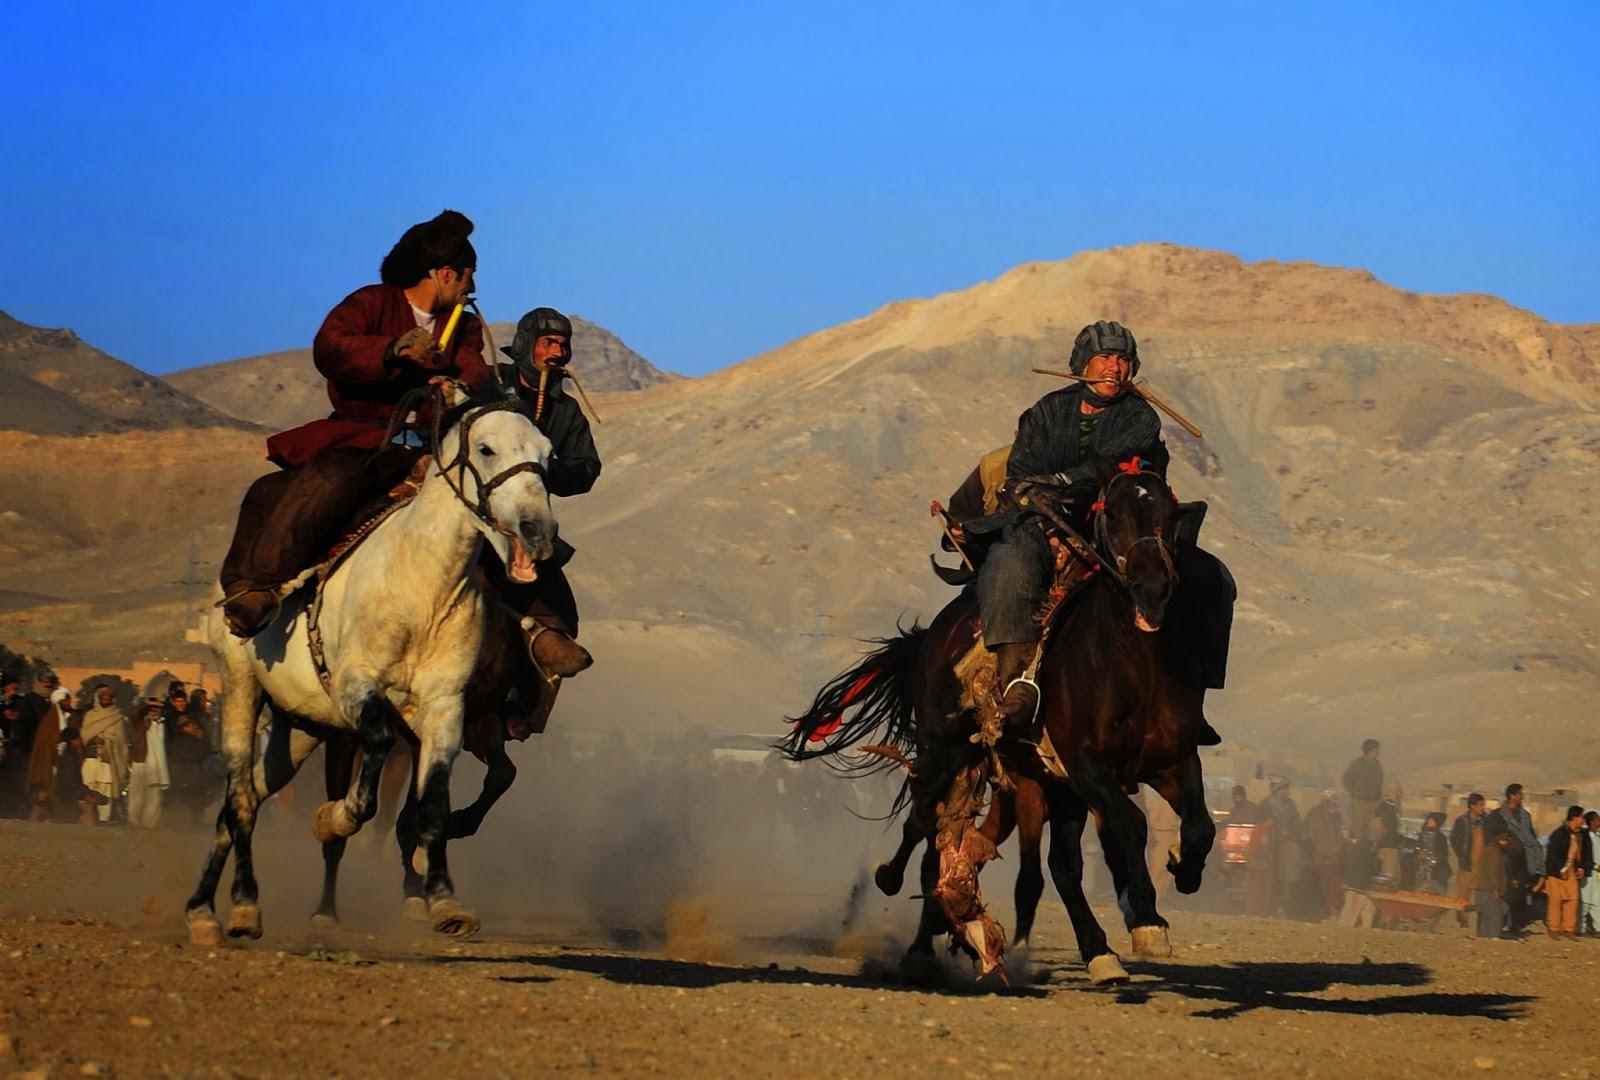 Afghanistan, Animal, Buzkashi, Carcass, Game, Herat, Horse, Horsemen, National, Rider, Sports, Tradition,